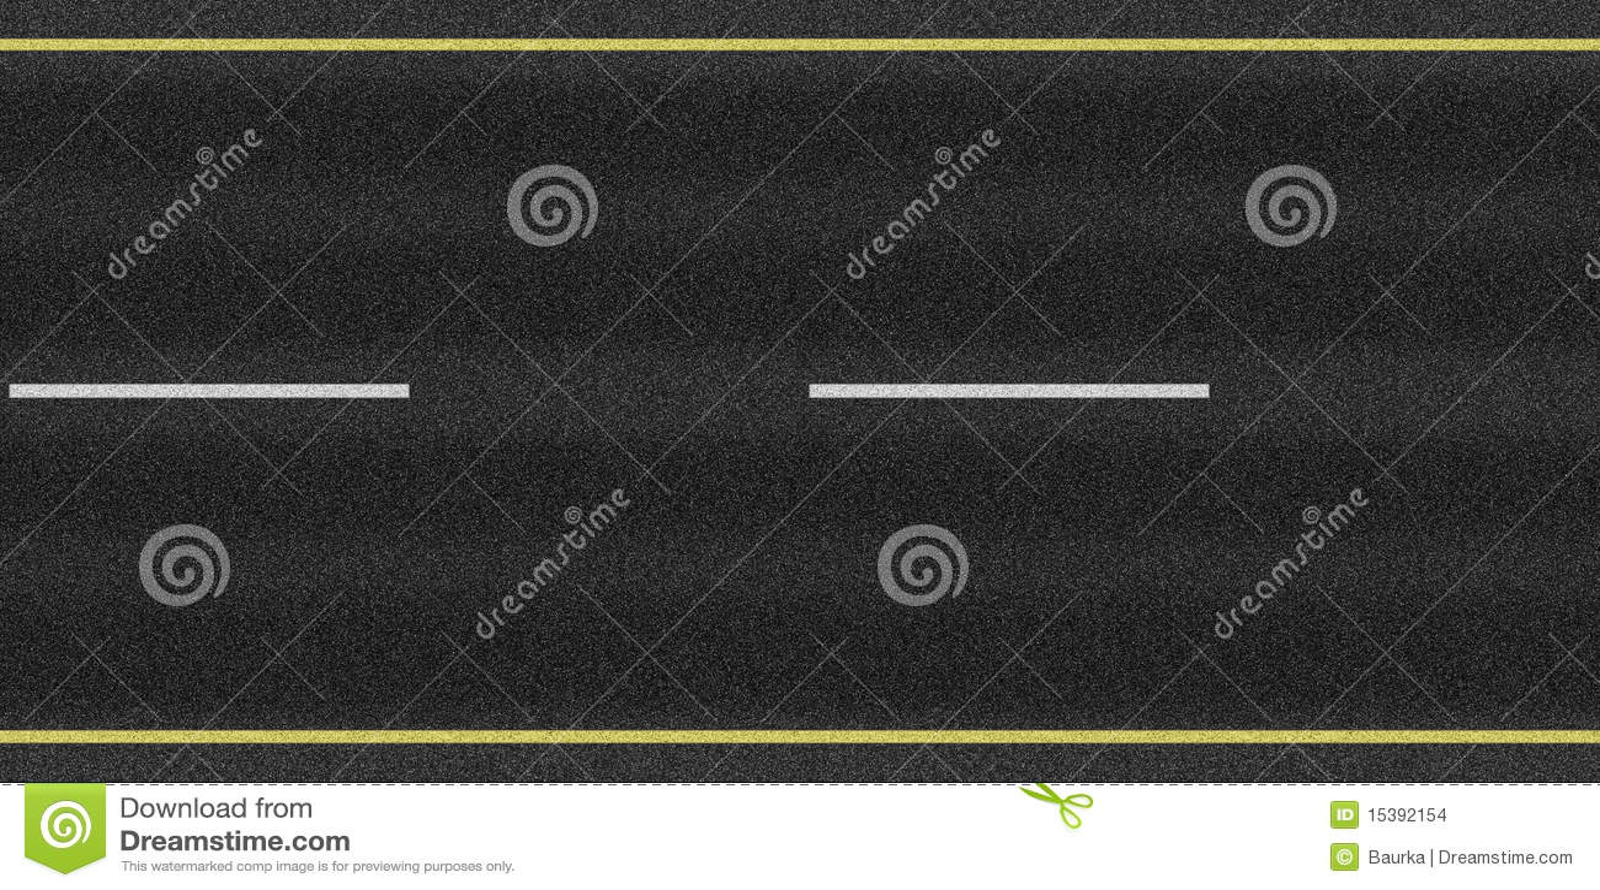 bucle de la textura de la carretera de asfalto stock de ilustraci n ilustraci n 15392154. Black Bedroom Furniture Sets. Home Design Ideas